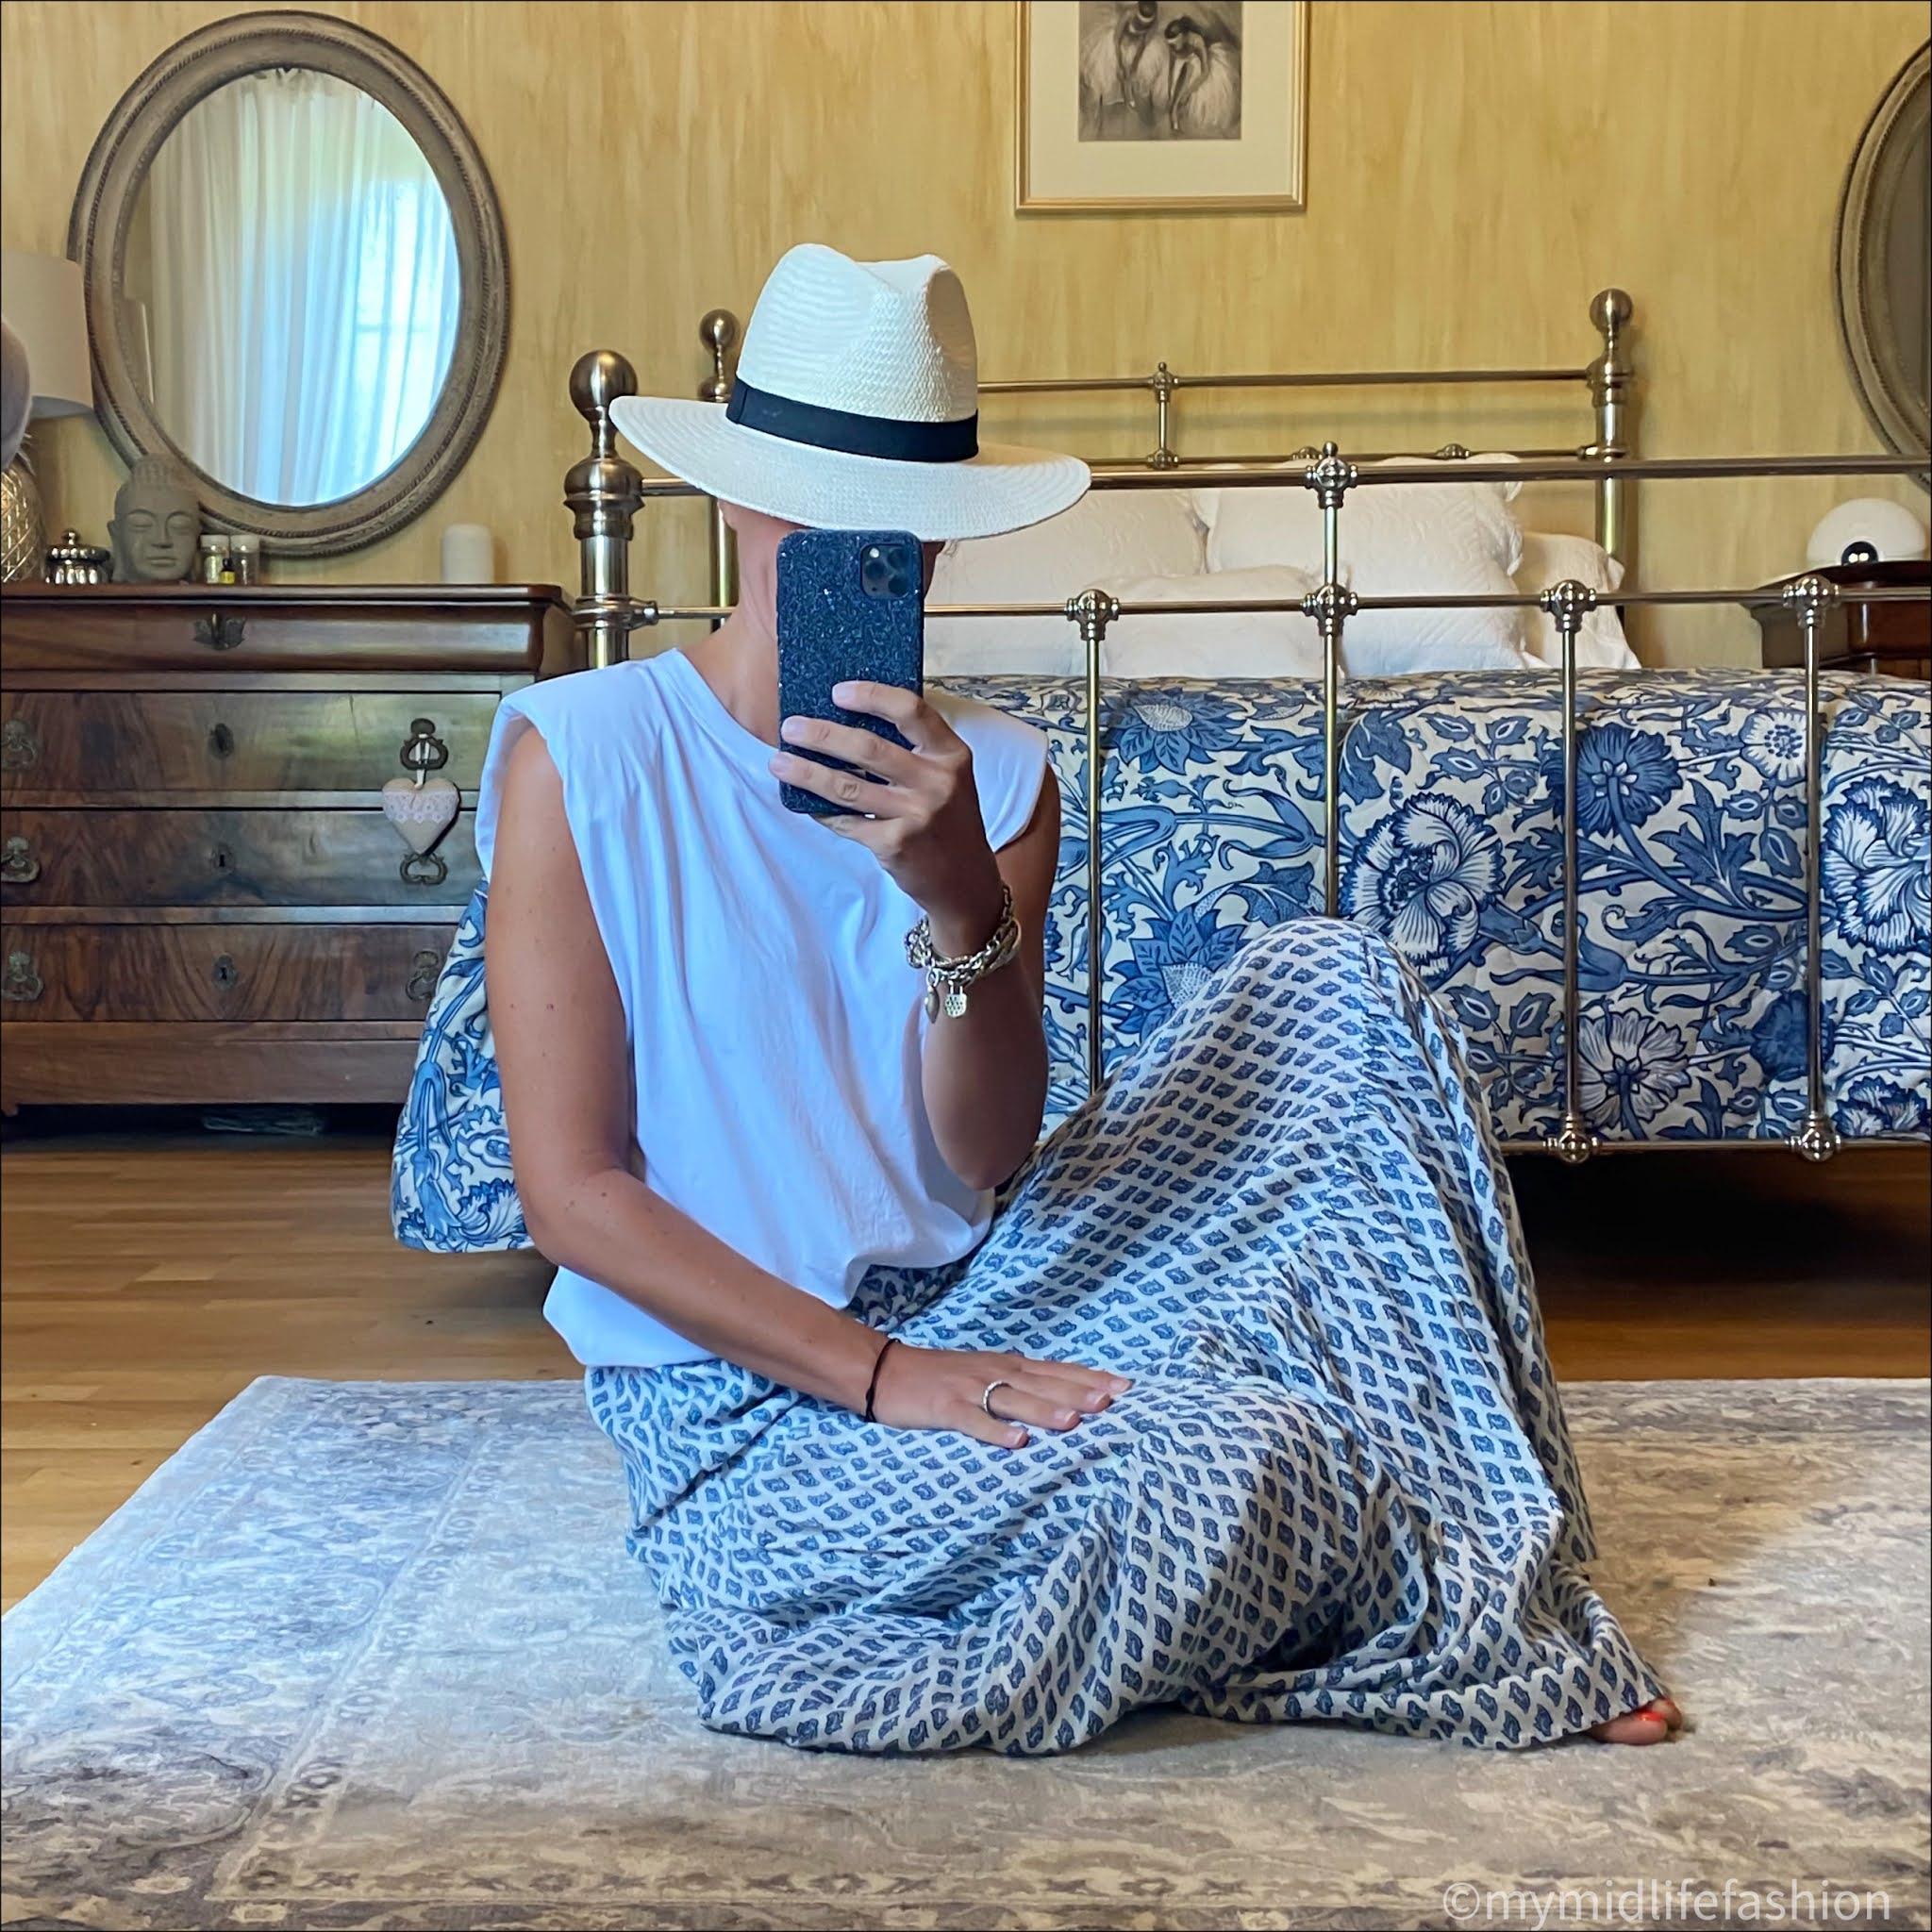 my midlife fashion, zara fedora hat, zara padded t-shirt, zara tiered maxi skirt